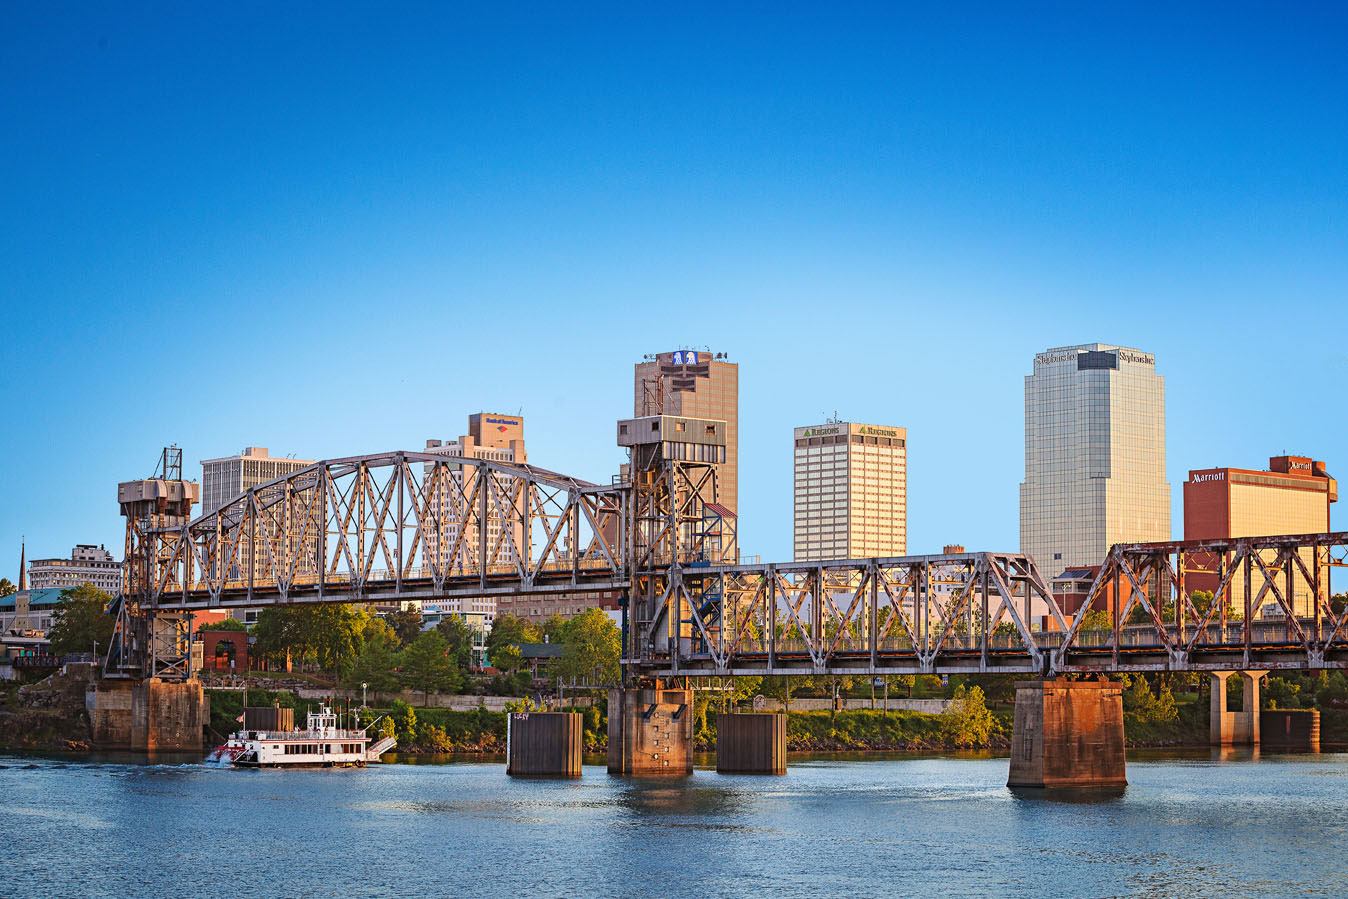 Now a pedestrian path, Junction Bridge spans the Arkansas River in Little Rock.